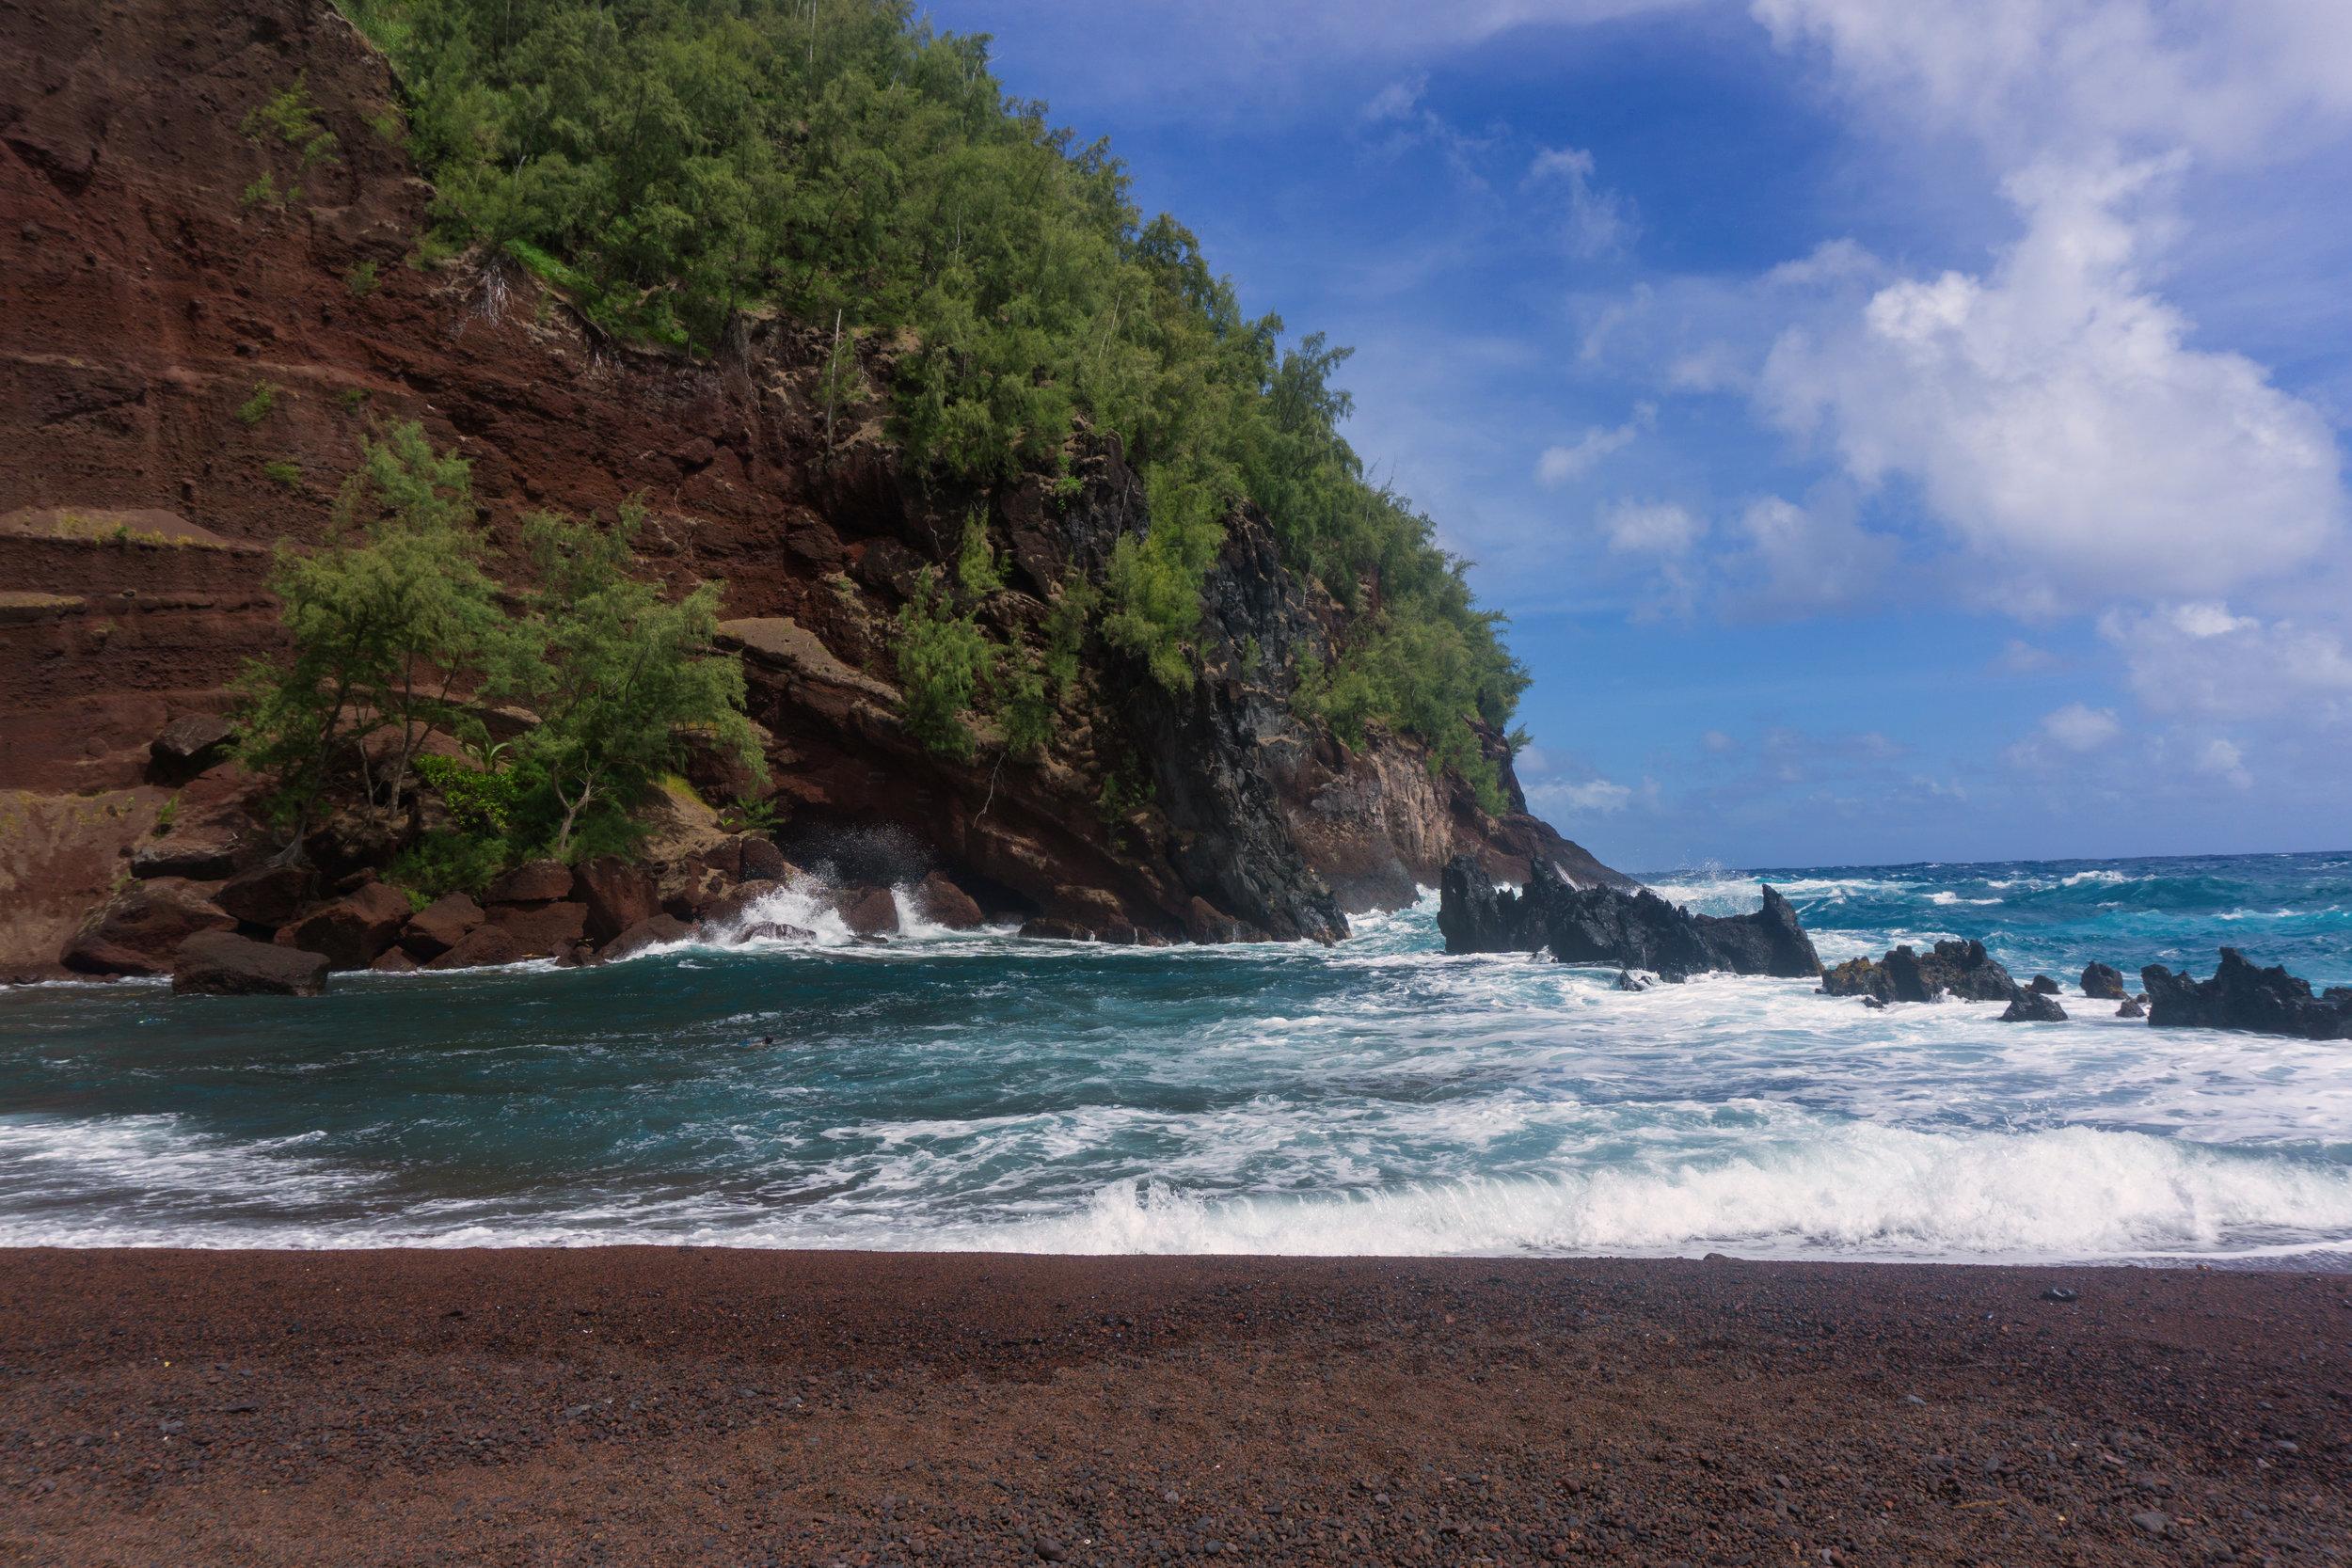 AstroBandit_Maui_Hawaii_JordanRose_Hana_RedSandBeach_22.jpg